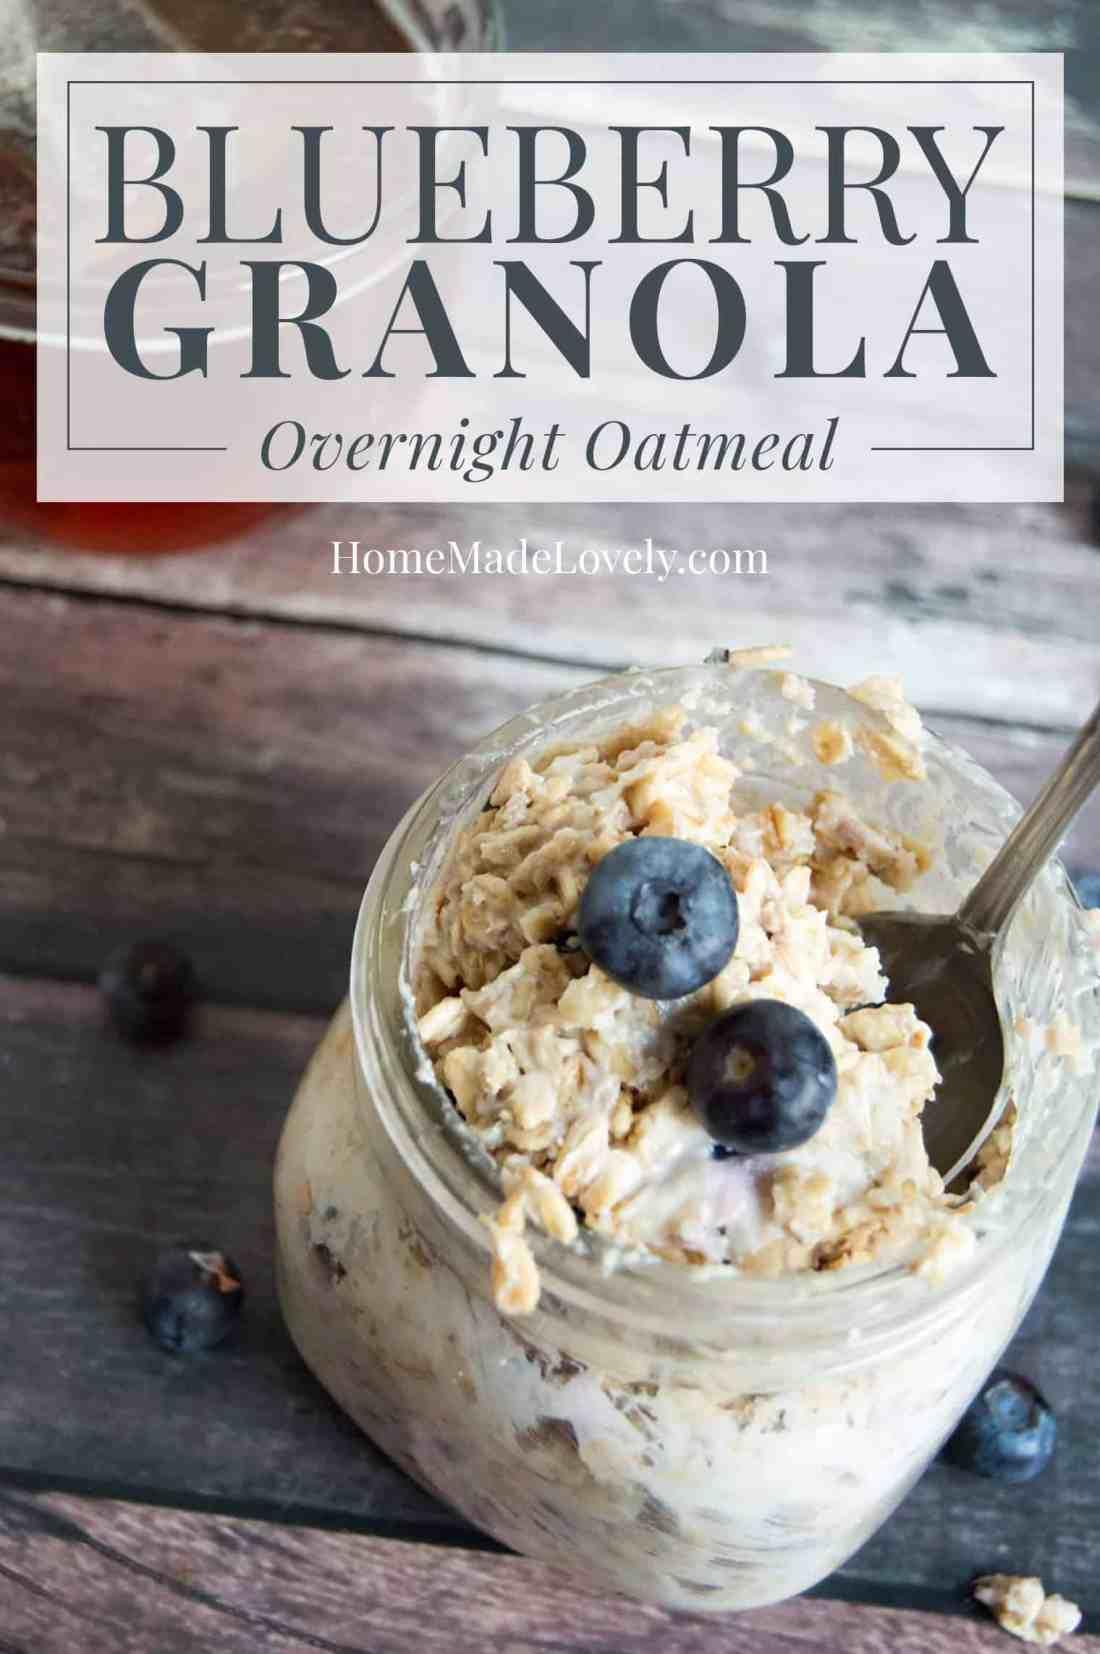 Blueberry Granola Overnight Oatmeal in mason jar on wood table